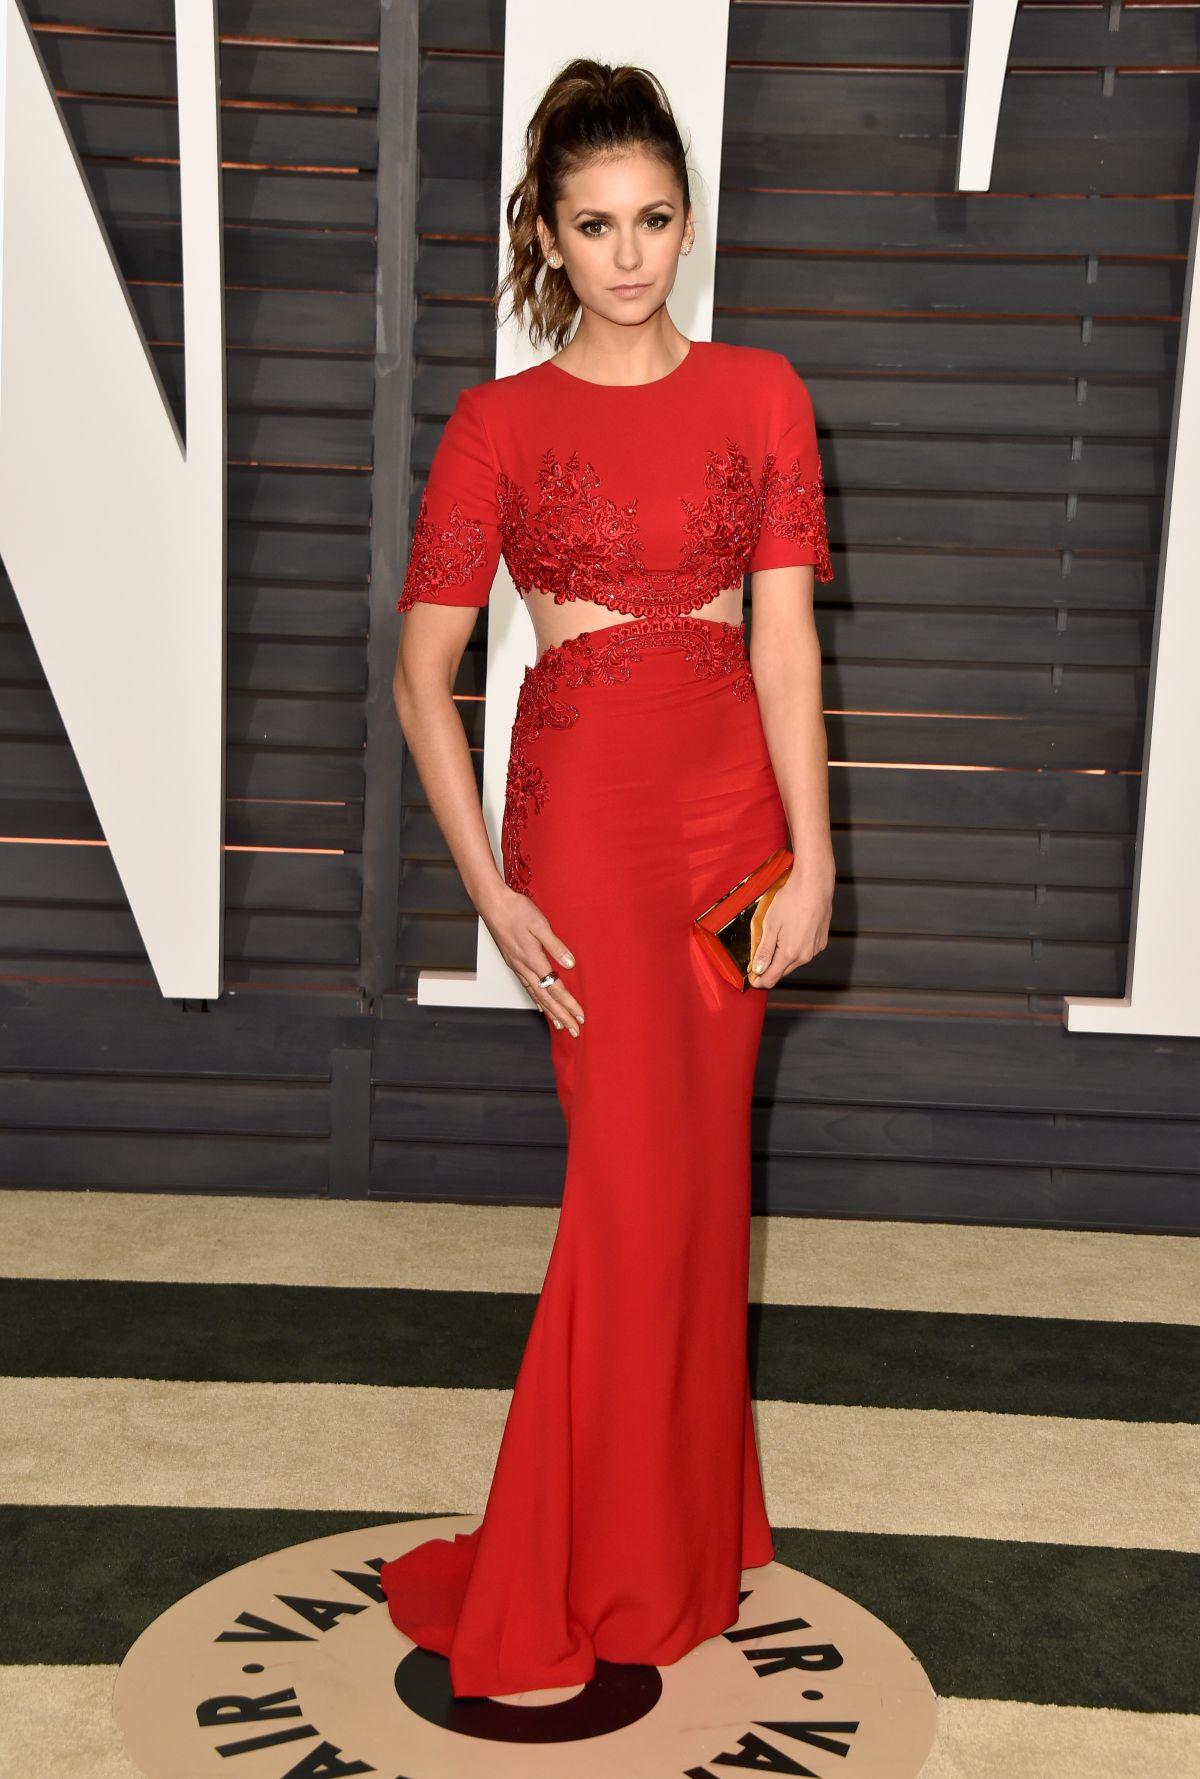 NINA DOBREV at Vanity Fair Oscar Party in Hollywood